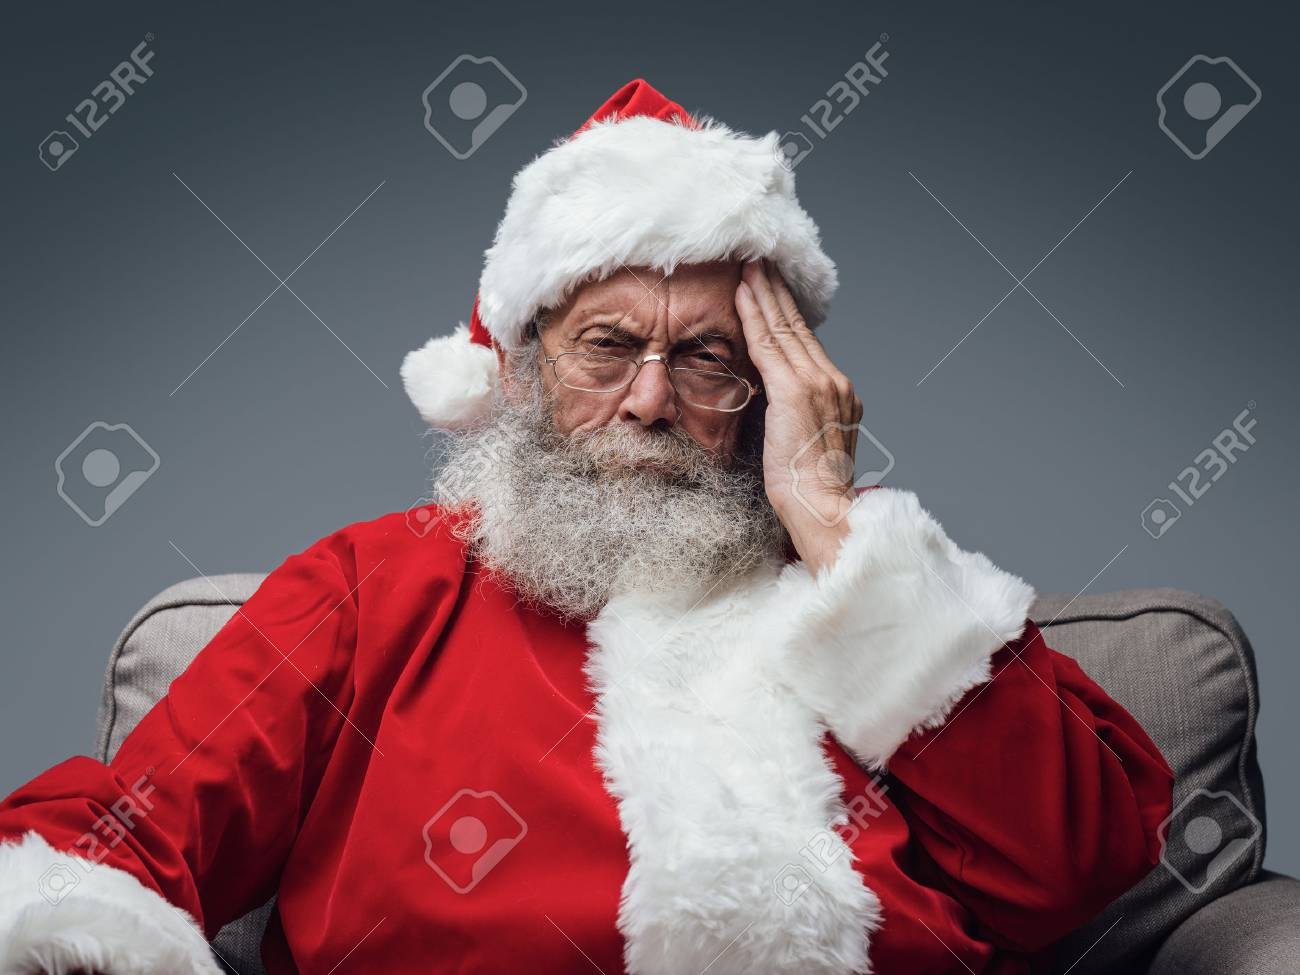 Sad Santa Claus having an headache on Chistmas Eve, stress and illness concept Stock Photo - 89097284